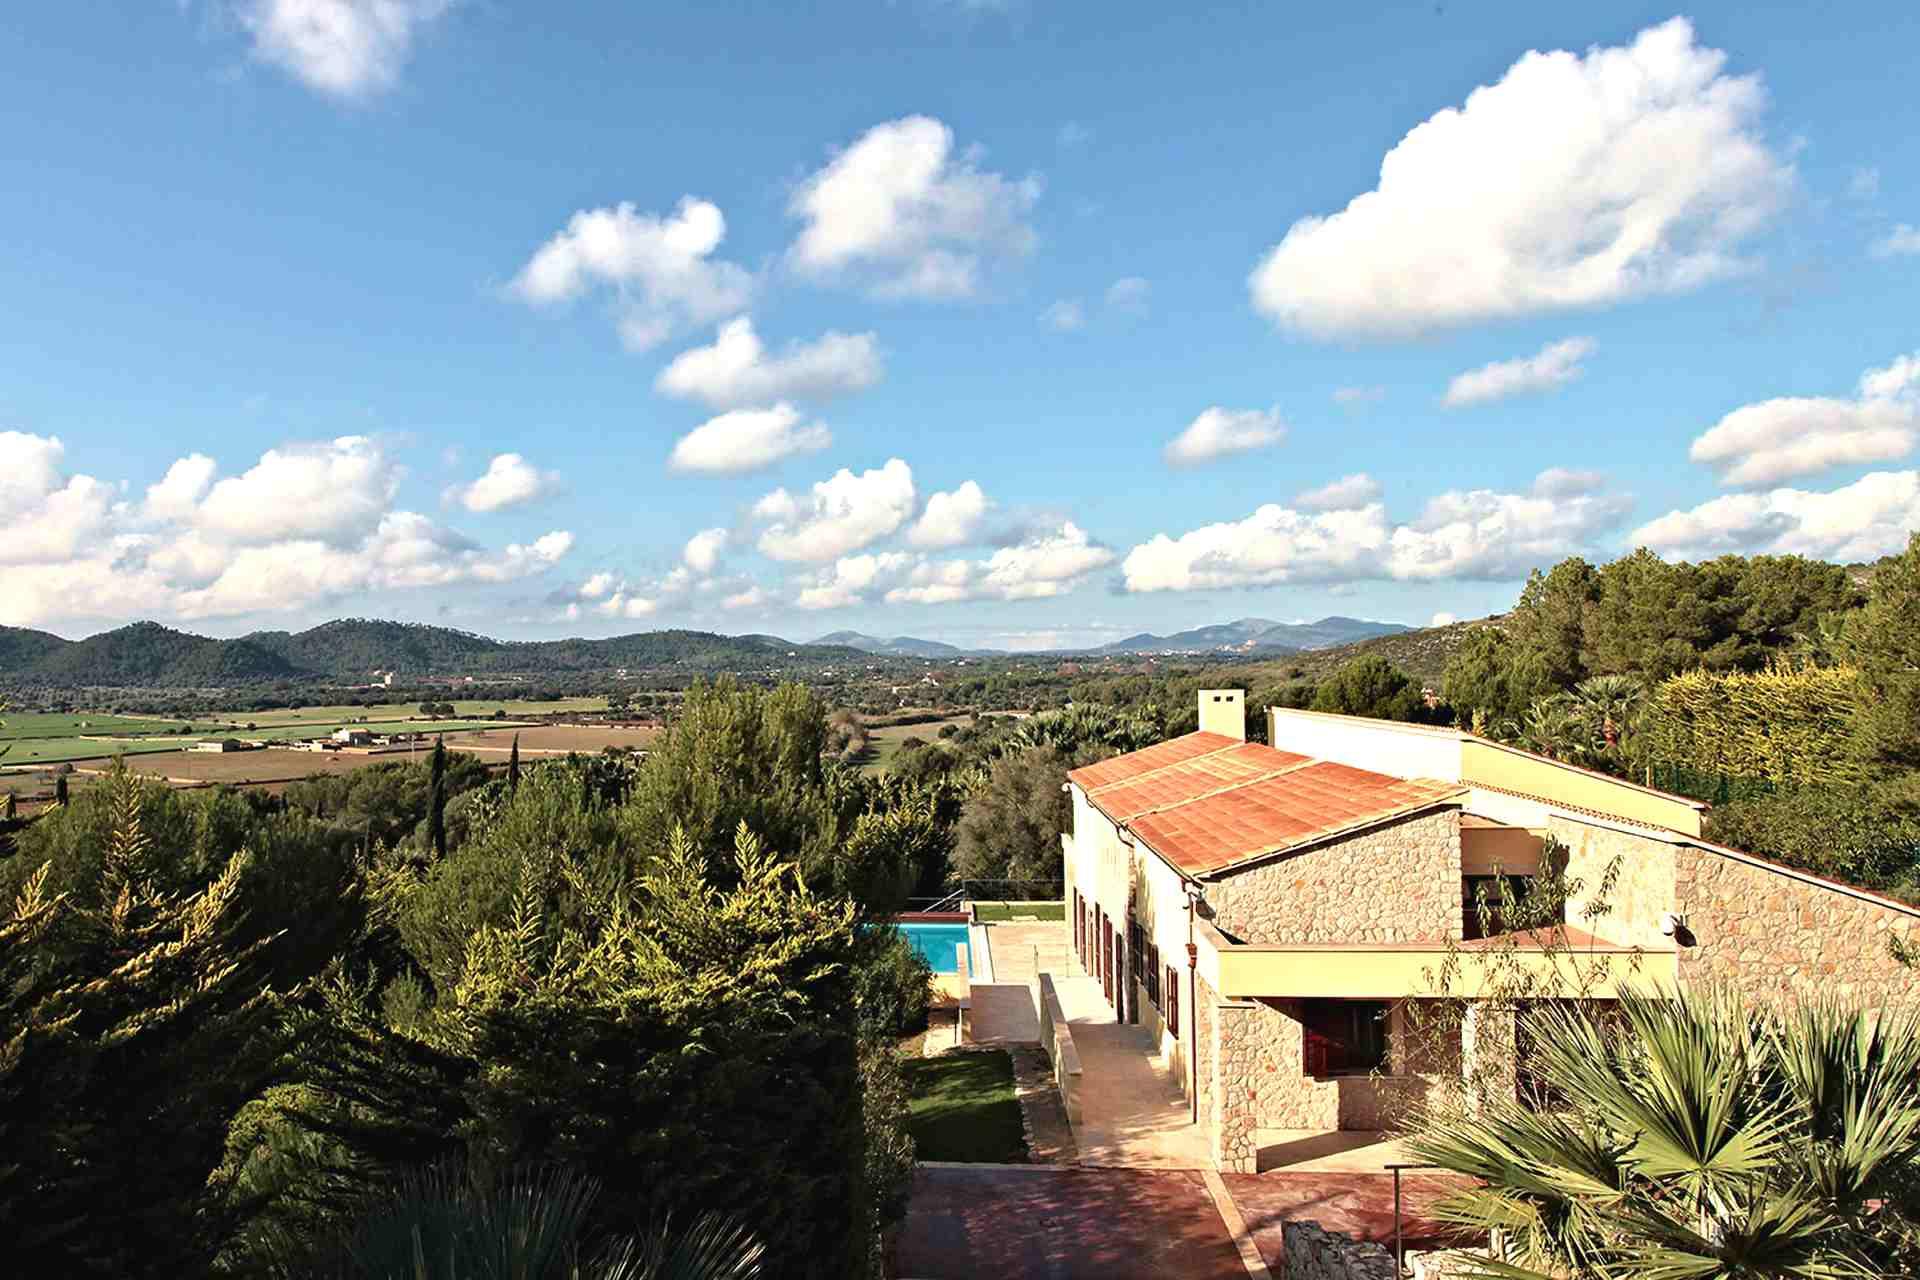 01-327 moderne Golfplatz Villa Mallorca Nordosten Bild 2